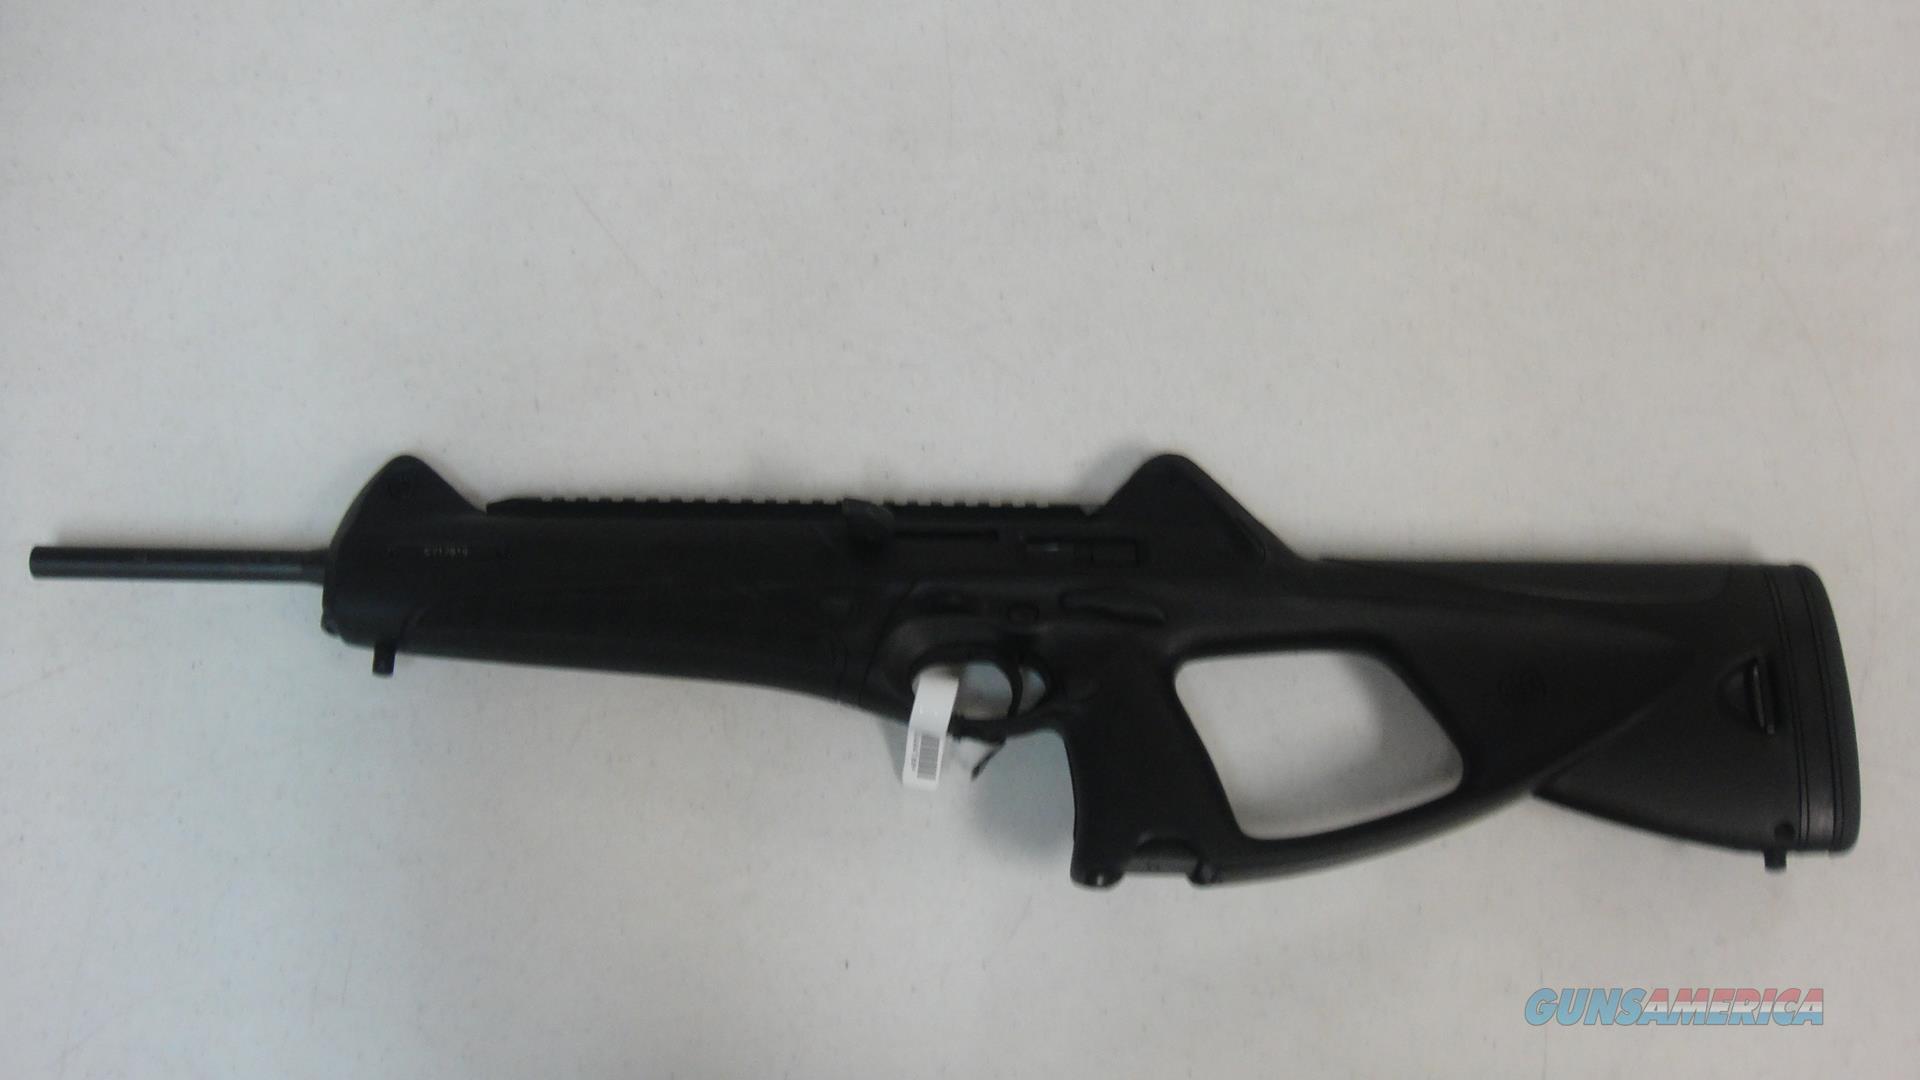 Beretta CX4 Storm  Guns > Rifles > Beretta Rifles > Storm